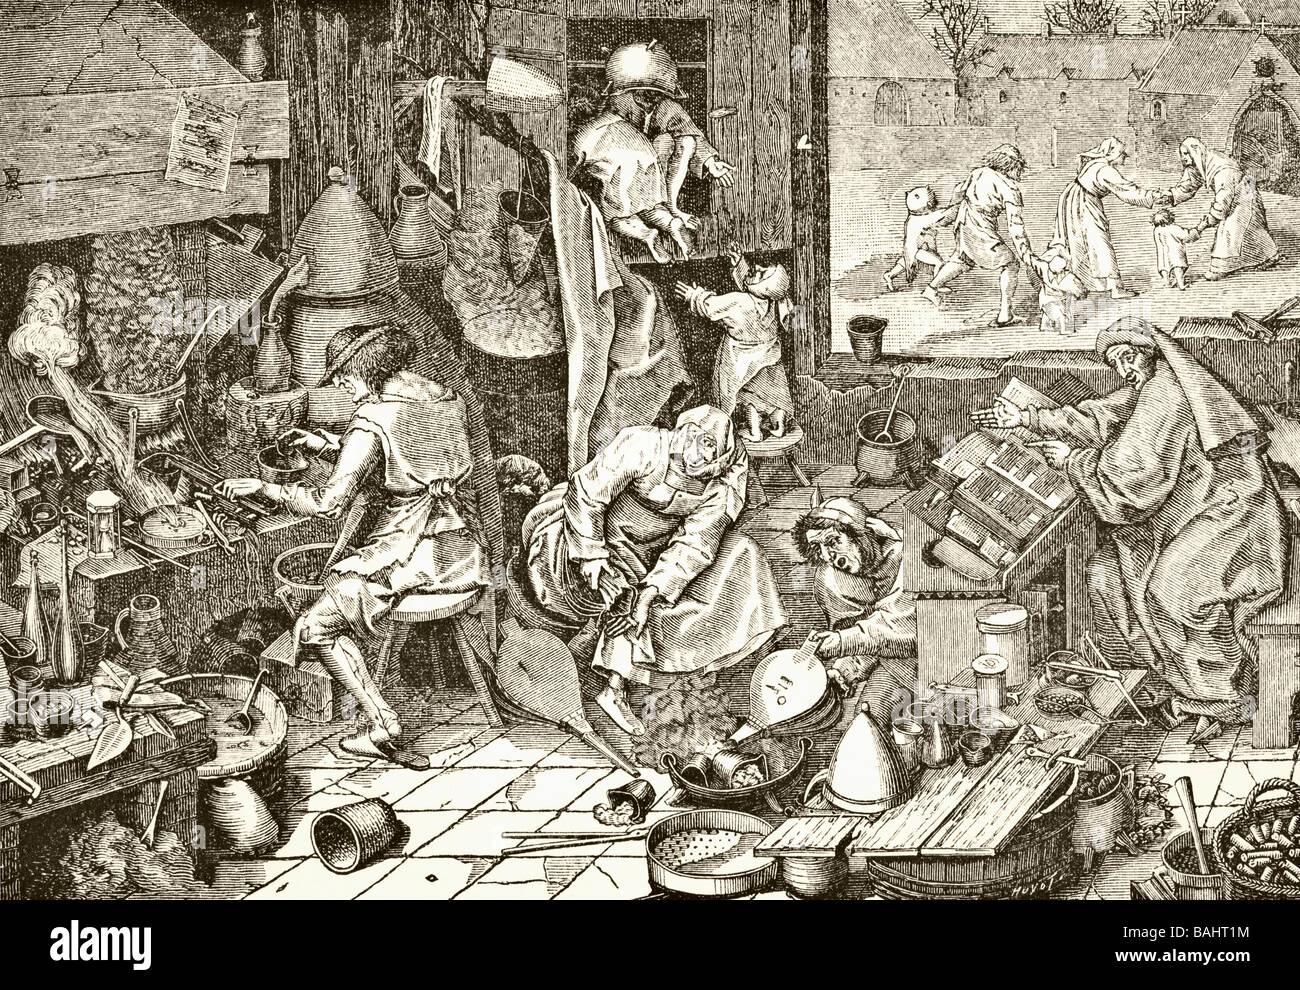 The Alchemist s Laboratory - Stock Image